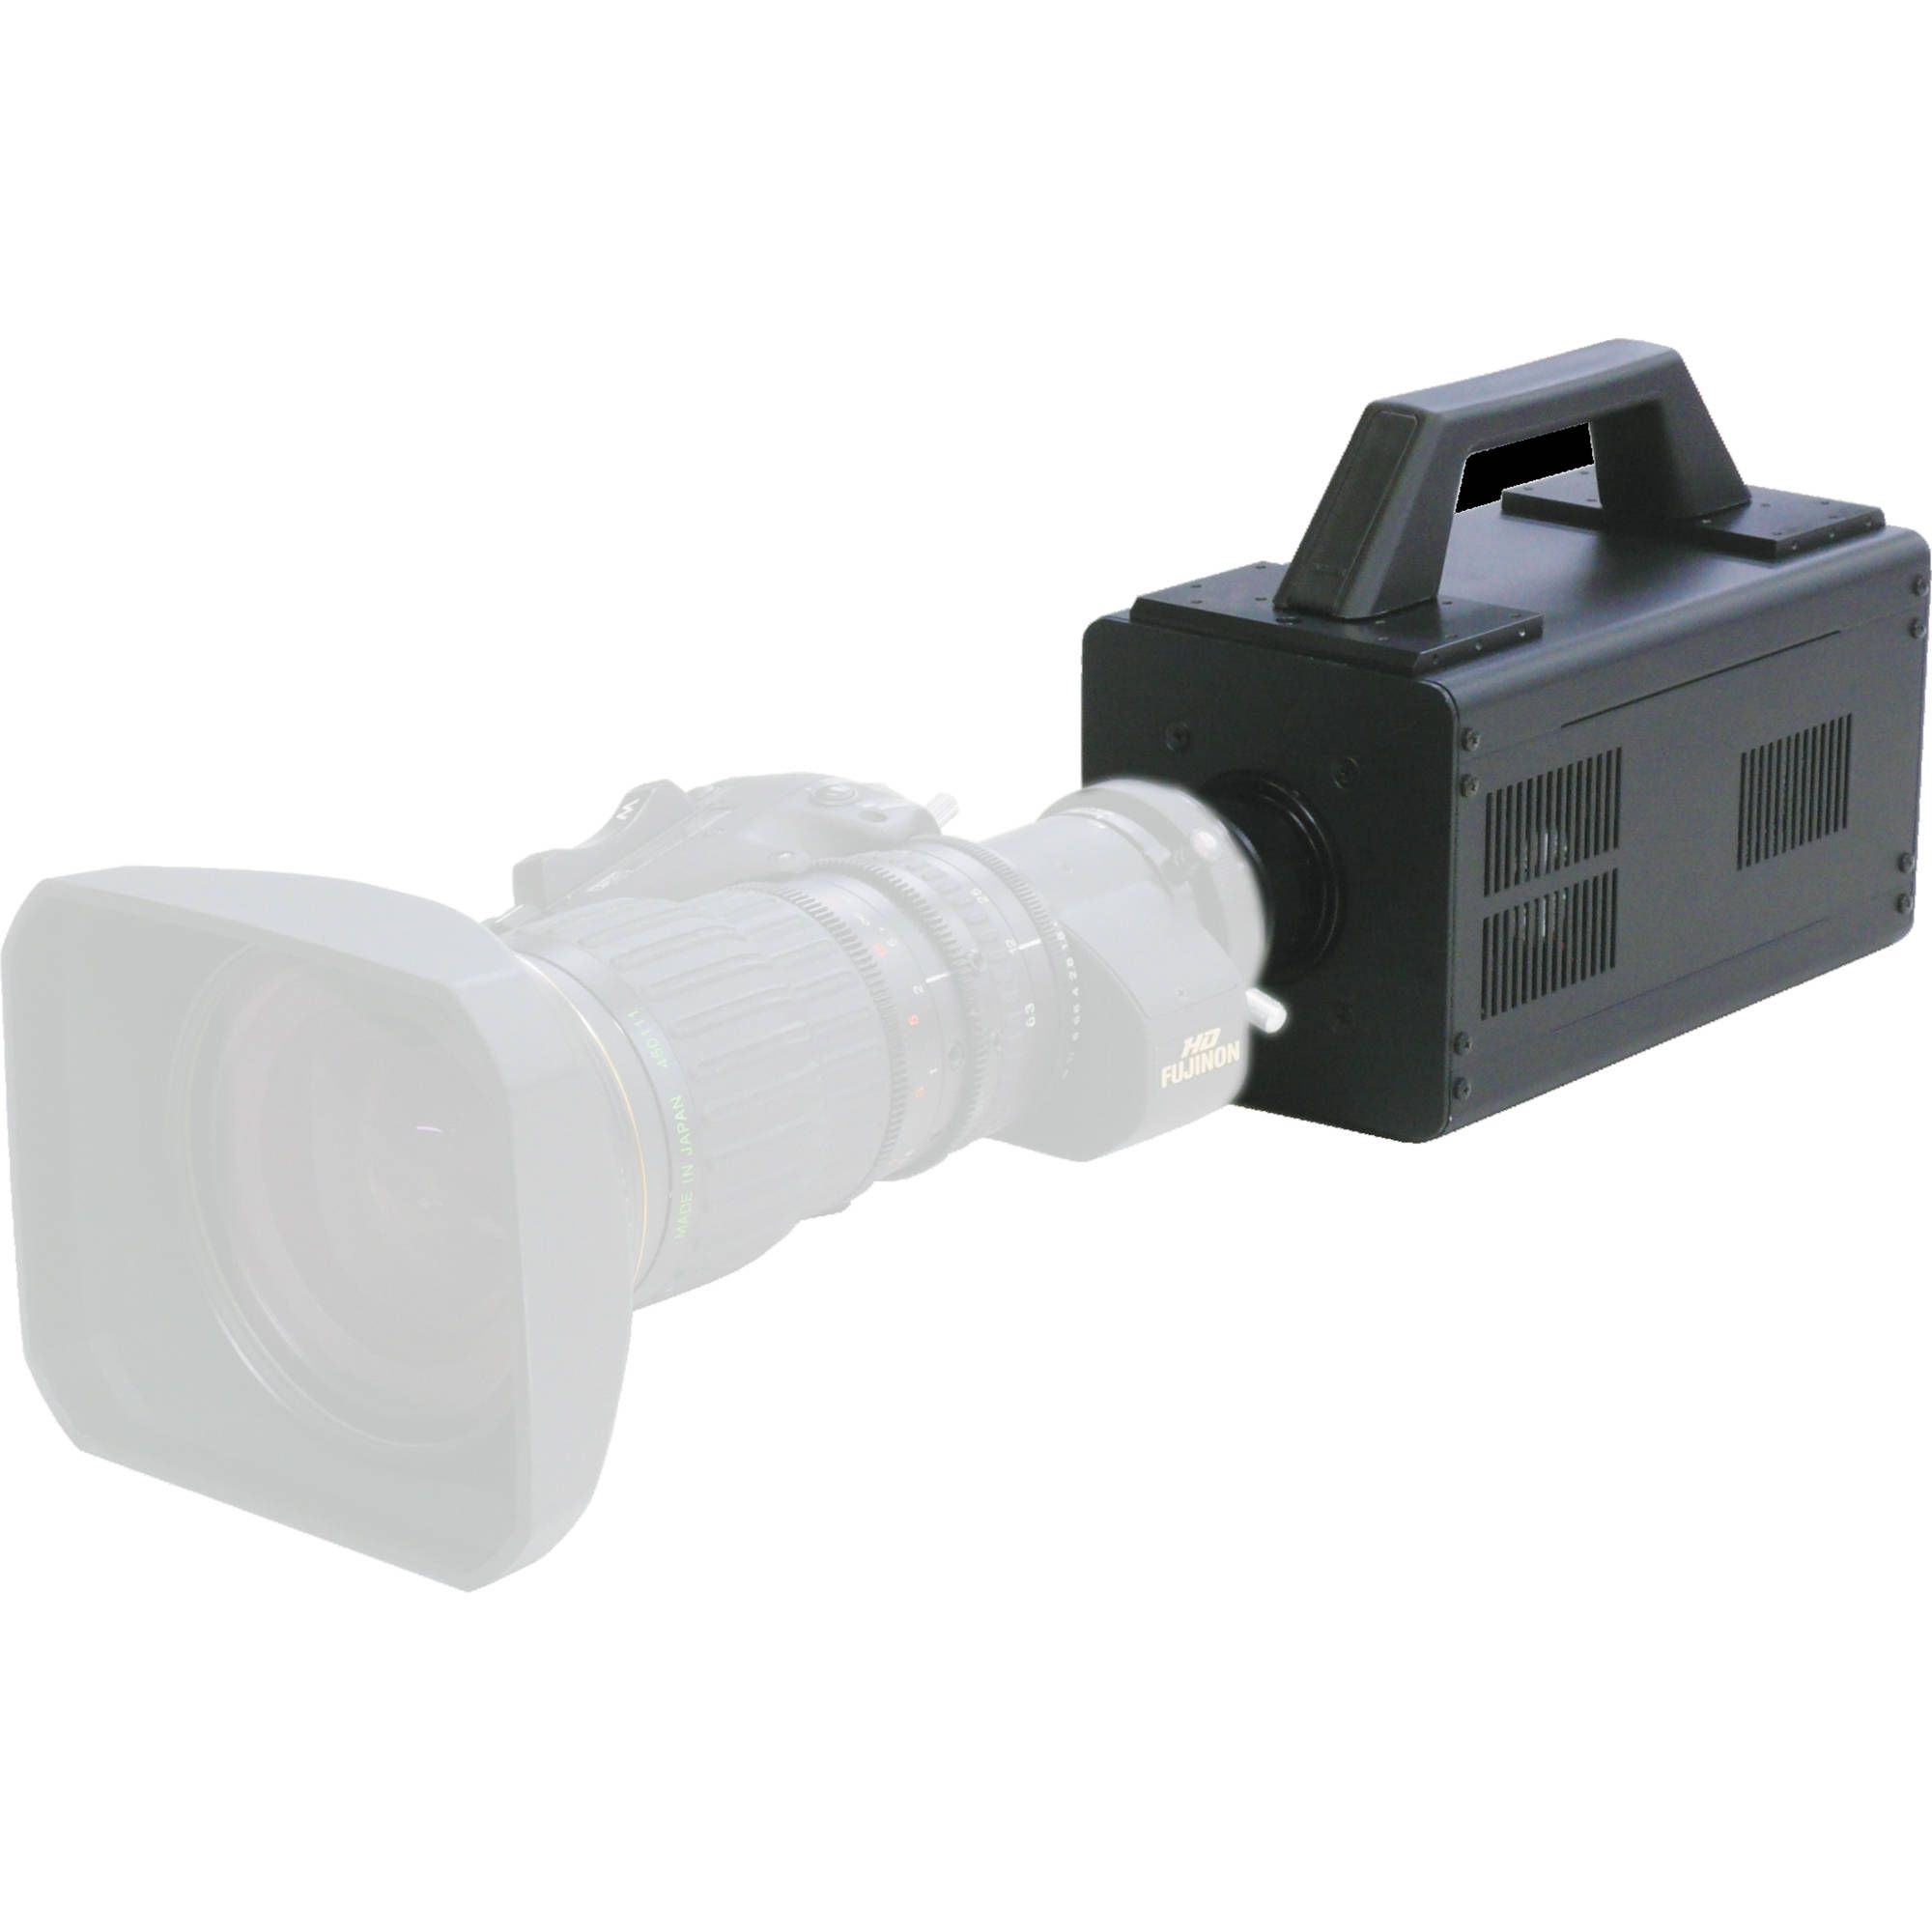 For A Em 120h S E Ultra Sensitive Em Ccd Hd Camera Em 120h S E